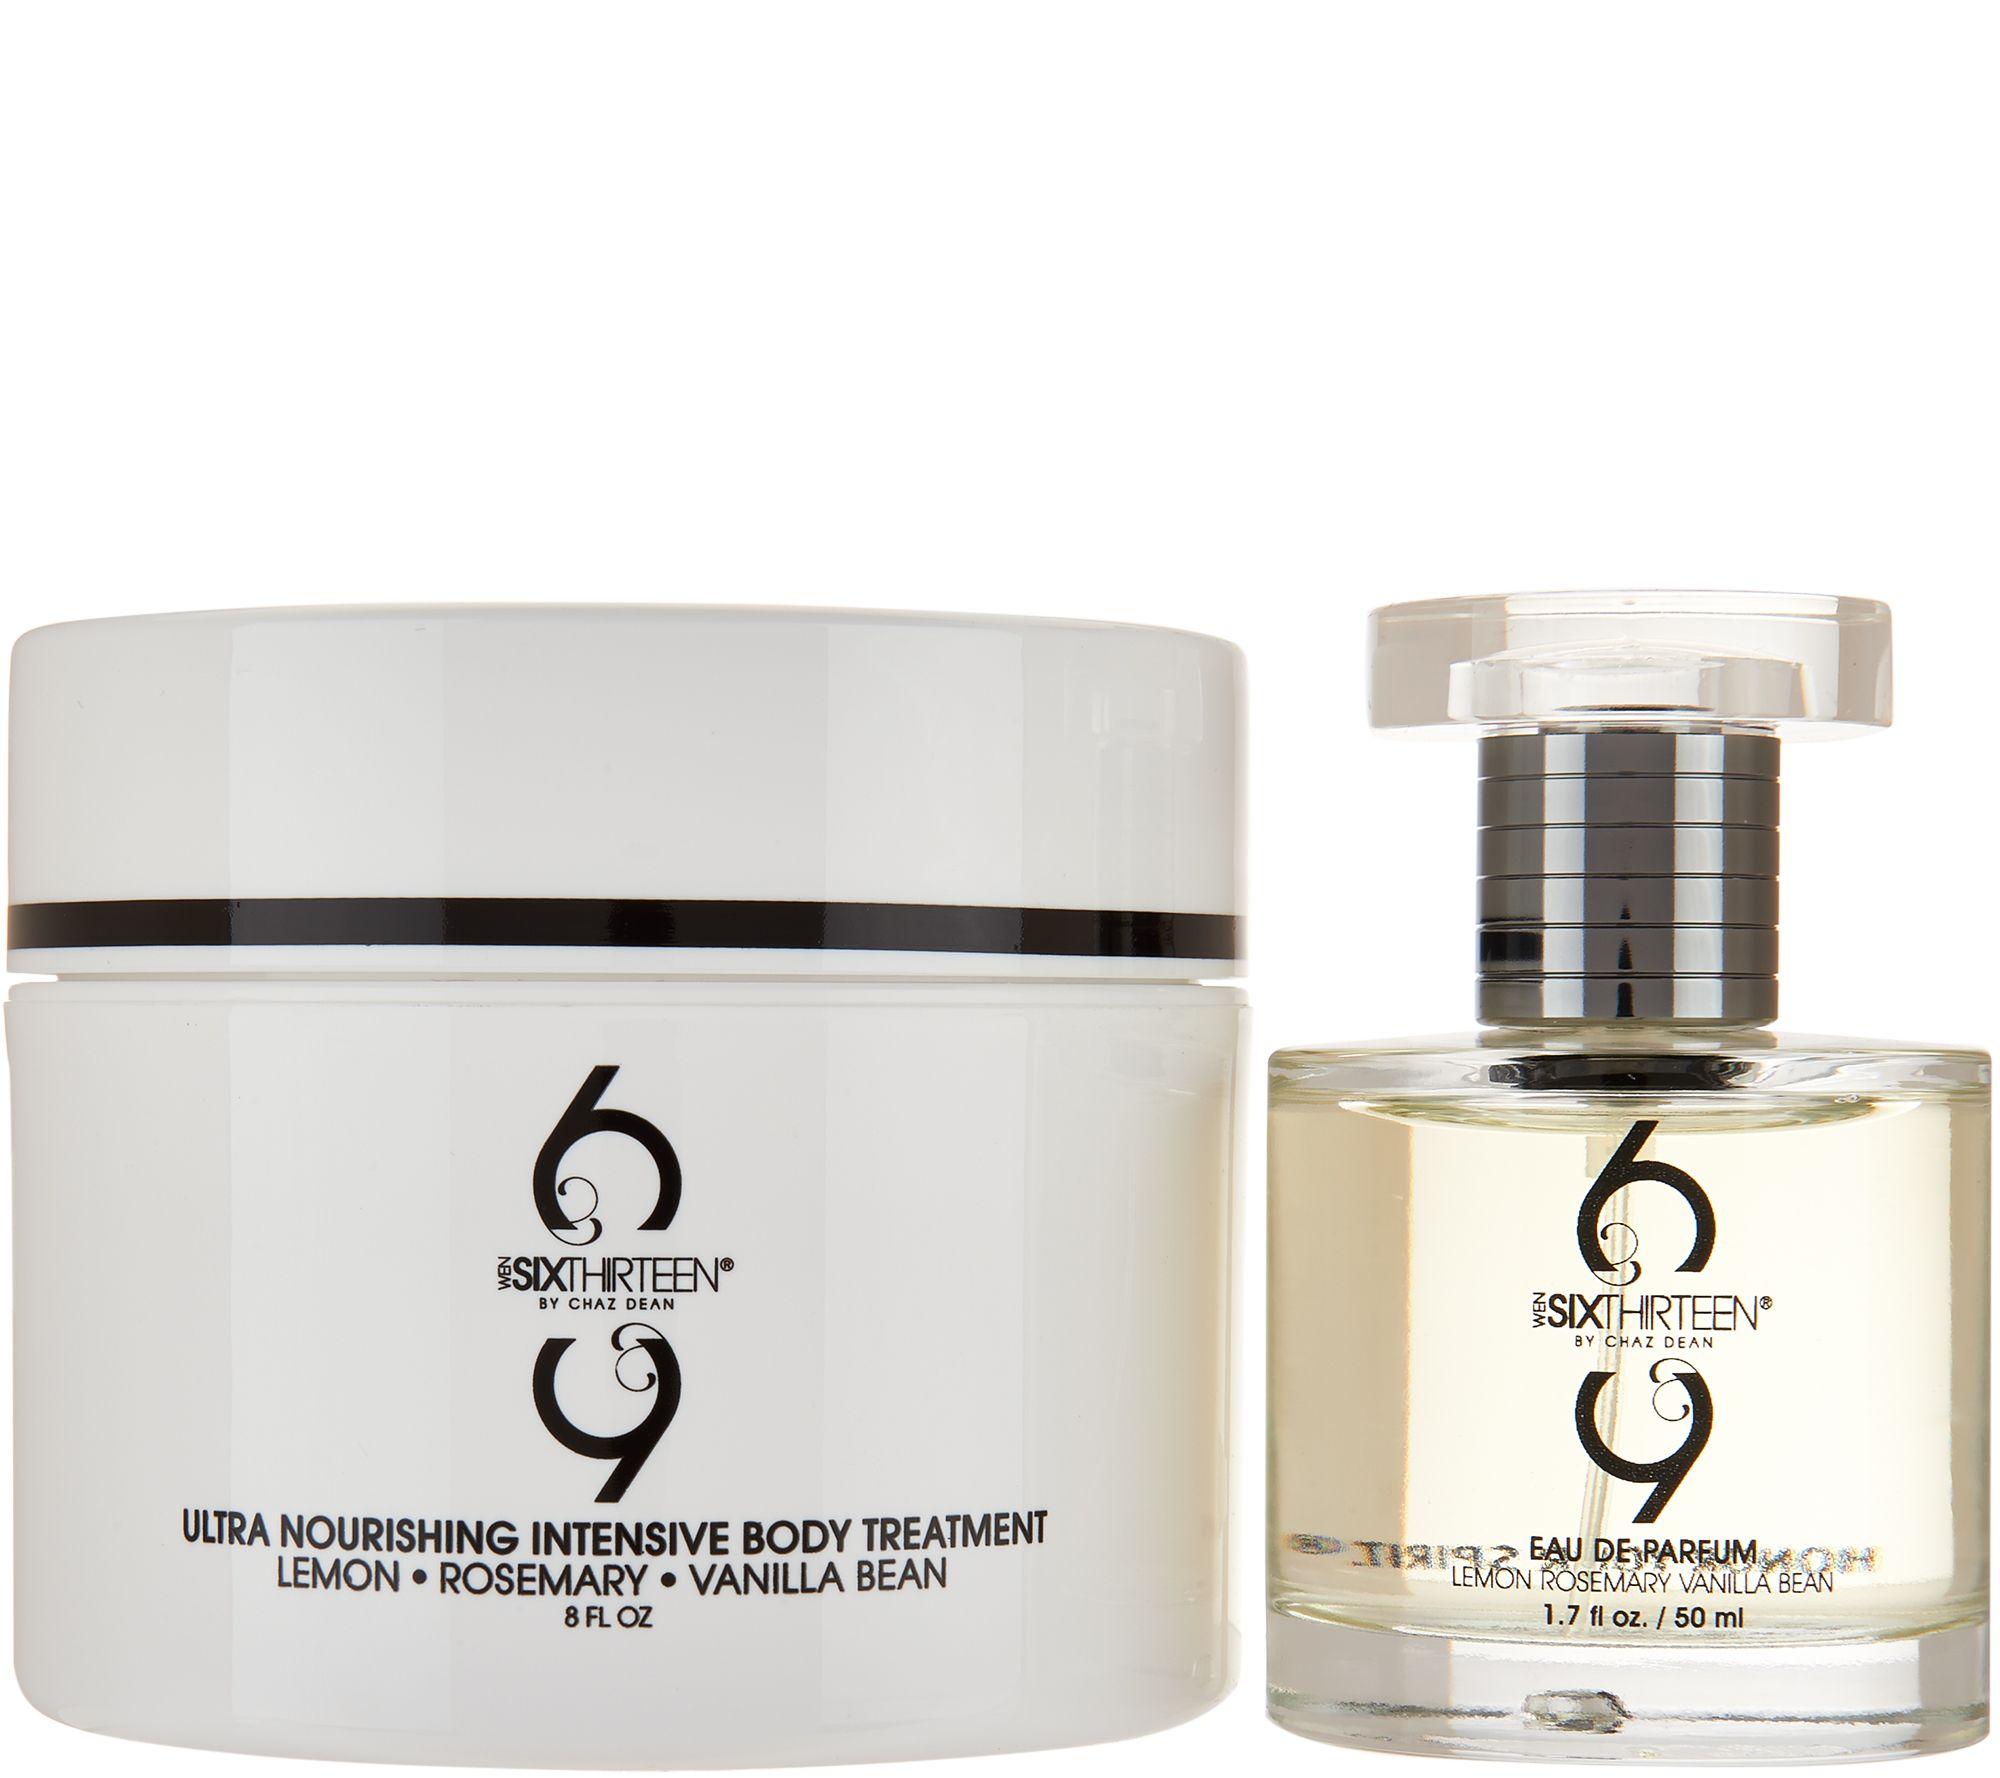 New customer qvc promo code - Wen By Chaz Dean 1 7 Oz Eau De Parfum With Body Treatment A298526